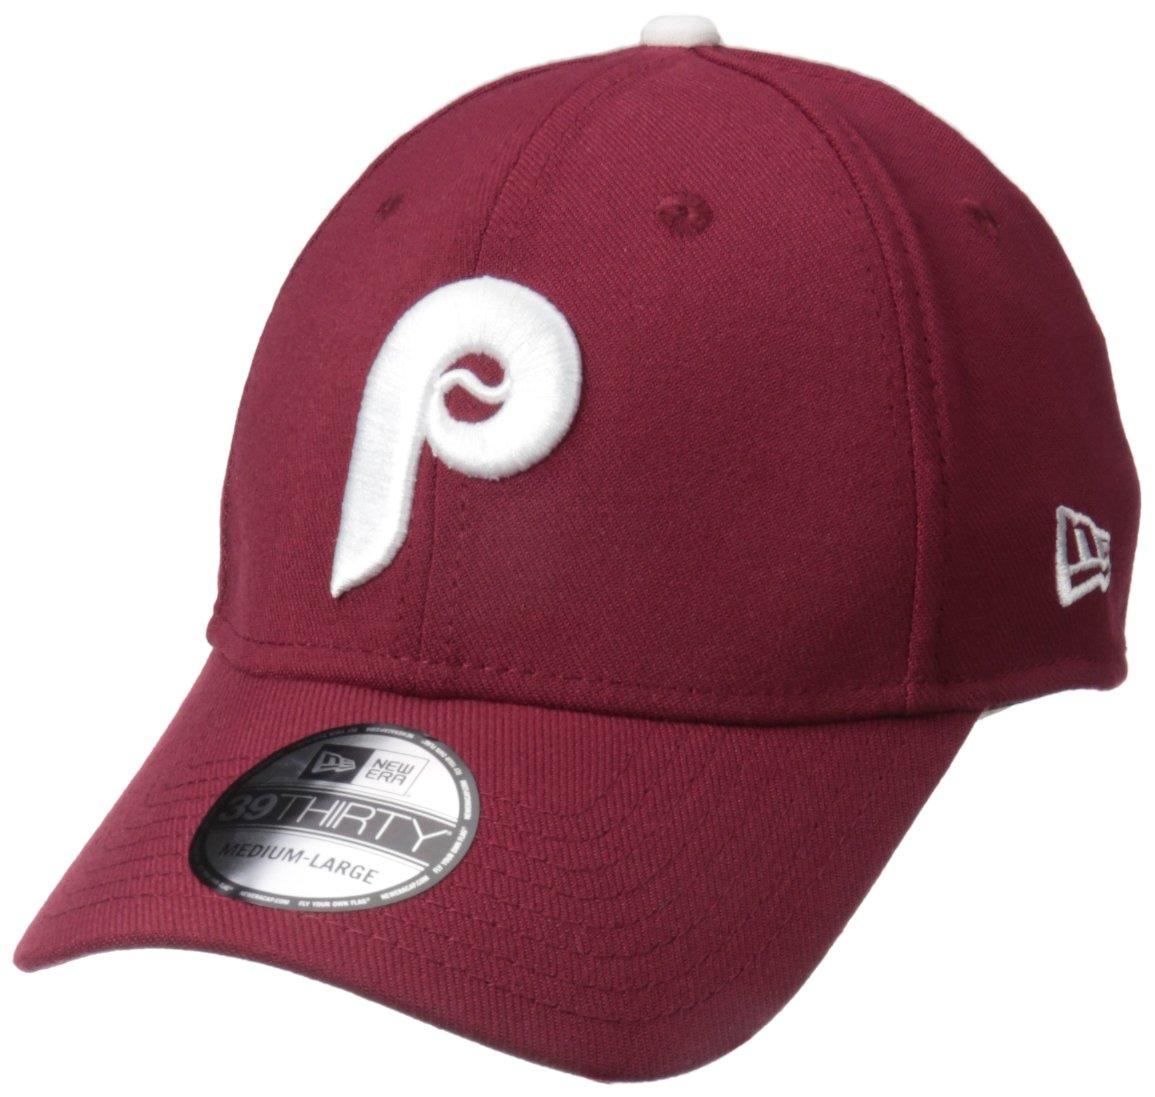 New Era MLB Philadelphia Phillies Cooperstown Team Classic 39Thirty Stretch Fit Cap, Small/Medium, Maroon